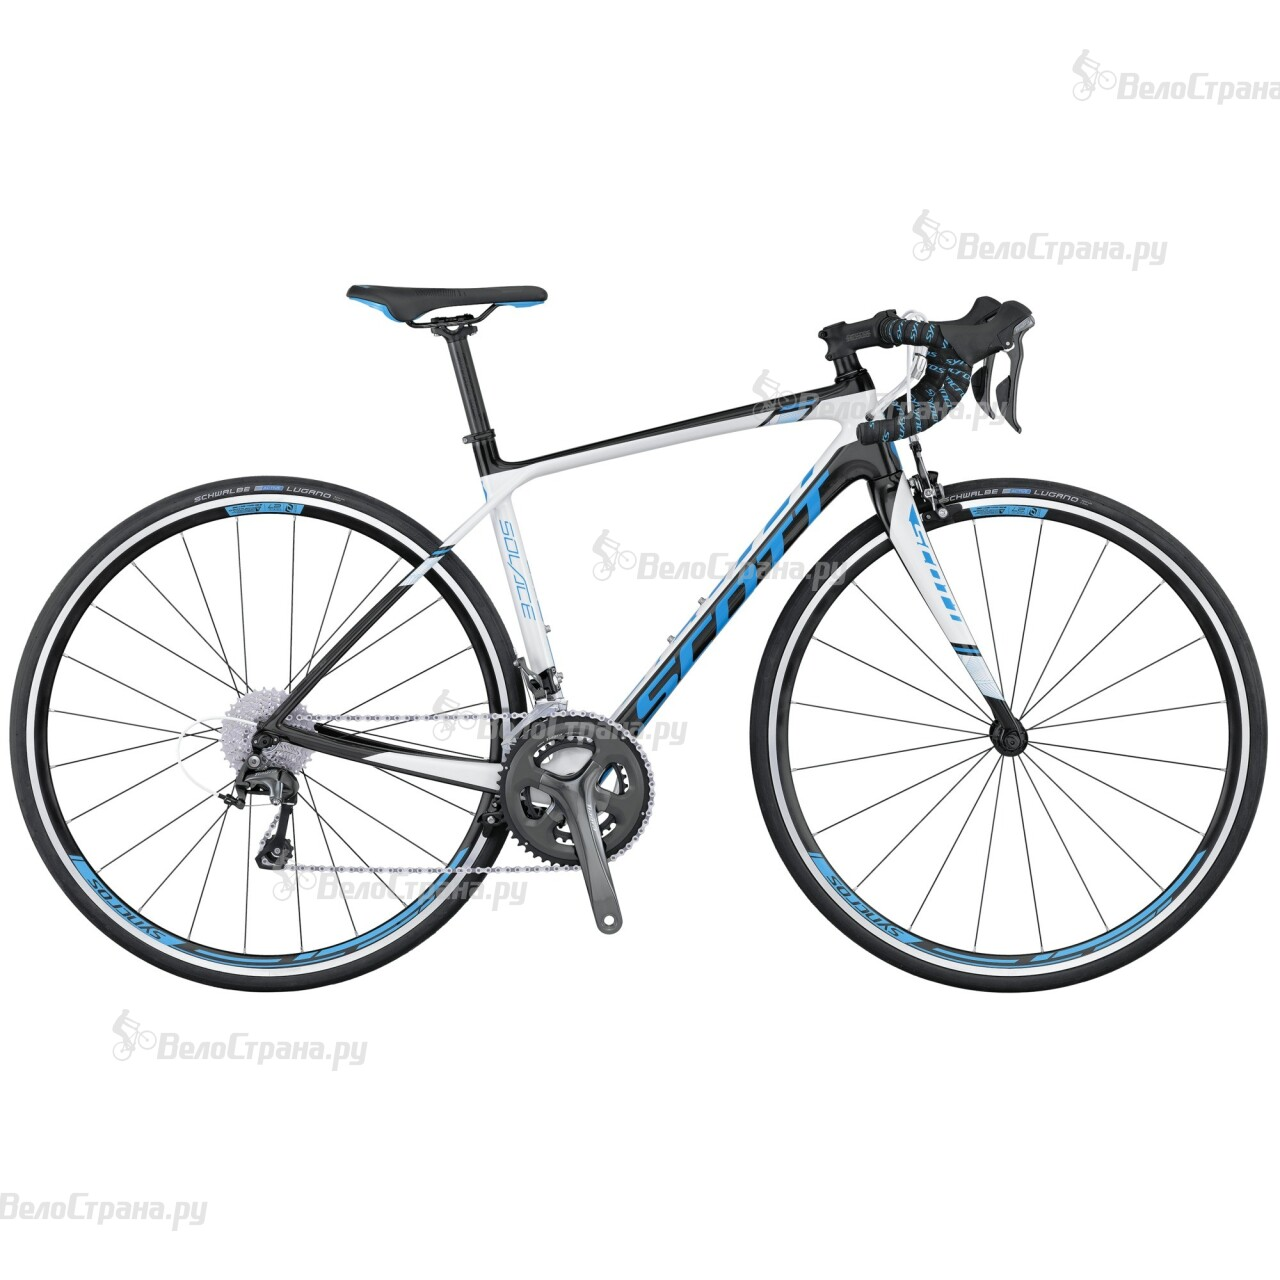 Велосипед Scott Contessa Solace 35 Compact (2016) велосипед scott contessa solace 15 compact 2015